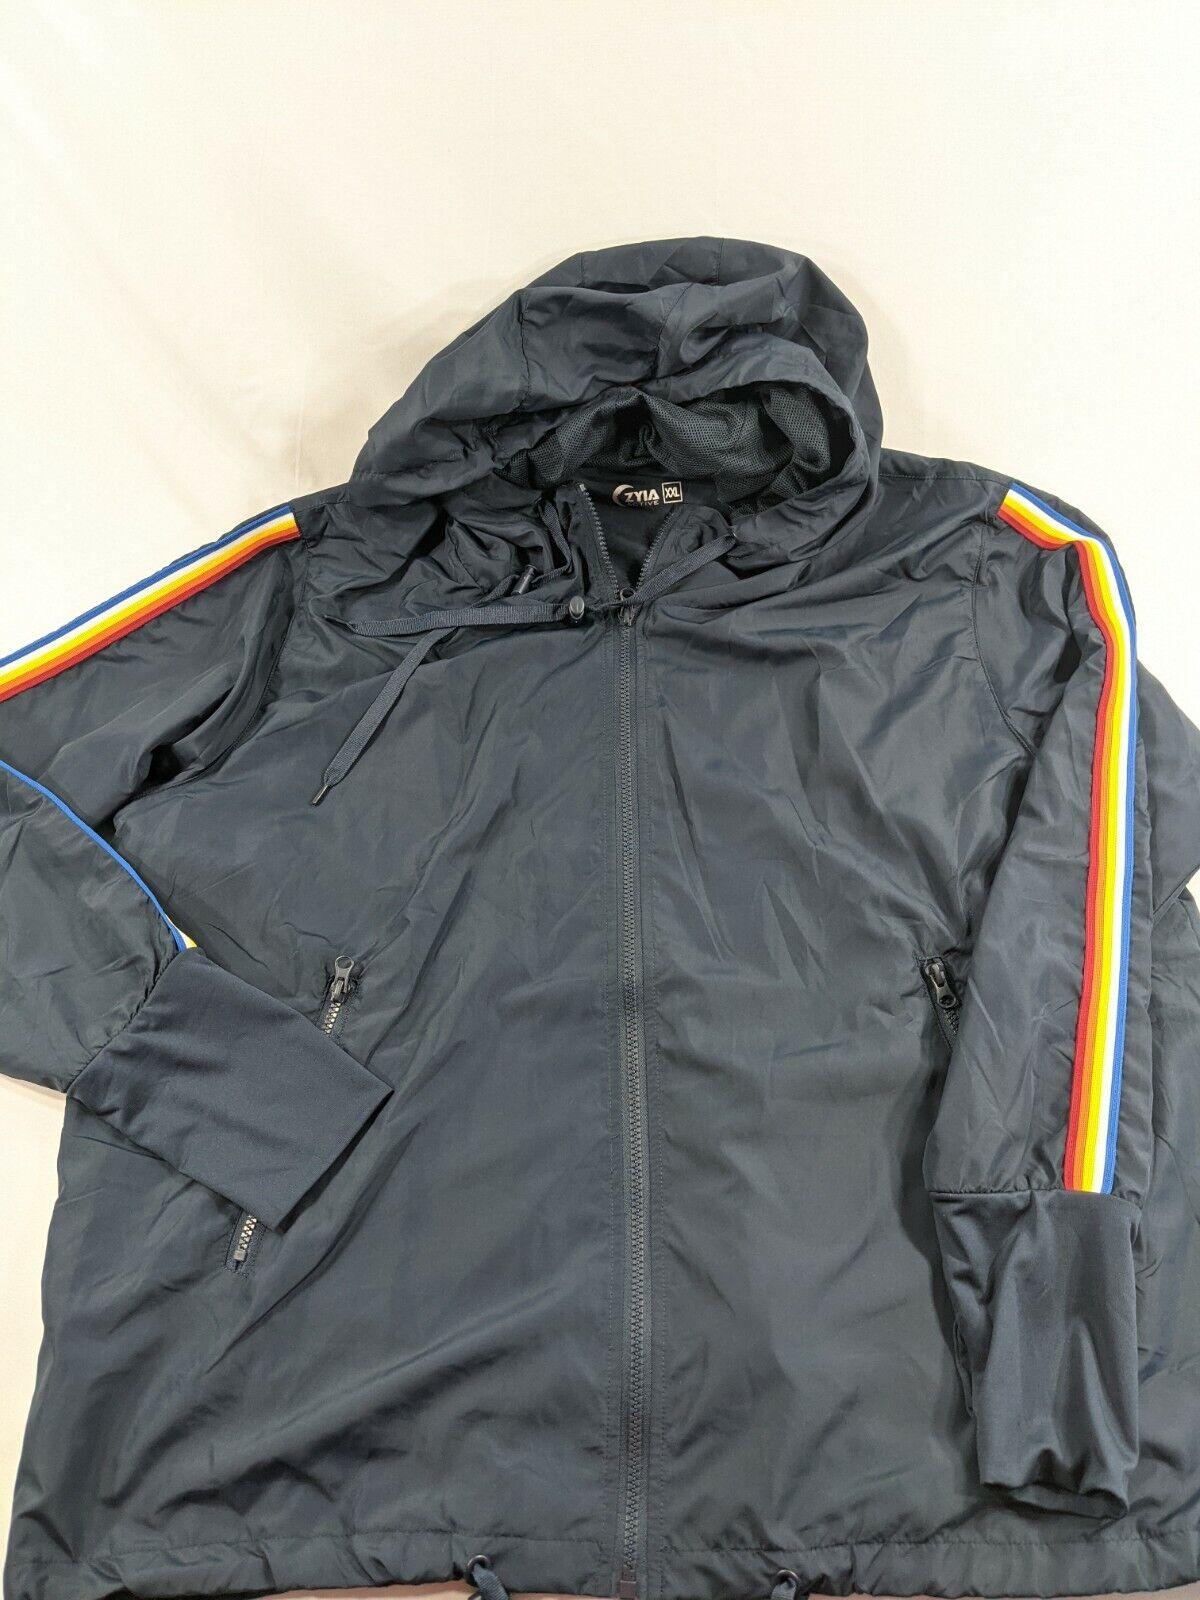 Zyia 🌙 Navy Rainbow Bomber Light Athletic Jacket Sz XXL Excellent condition